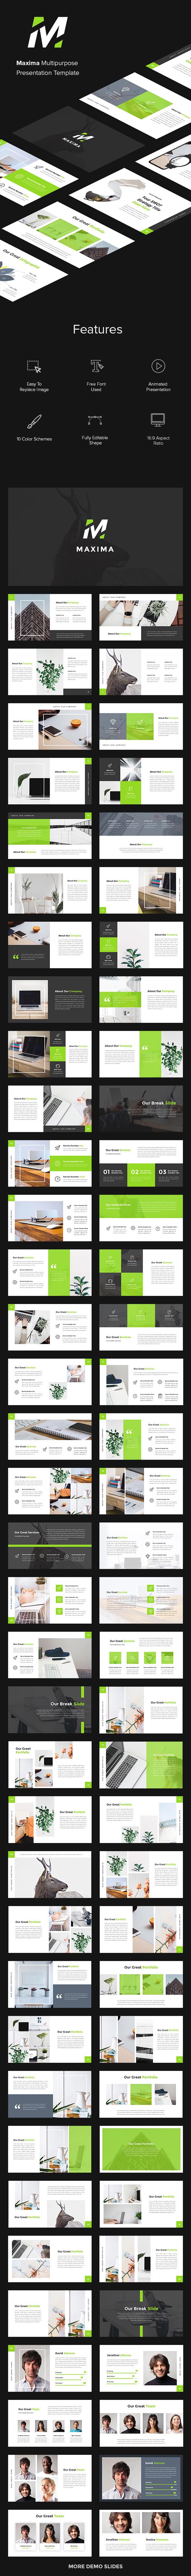 Maxima Multipurpose Keynote - Business Keynote Templates